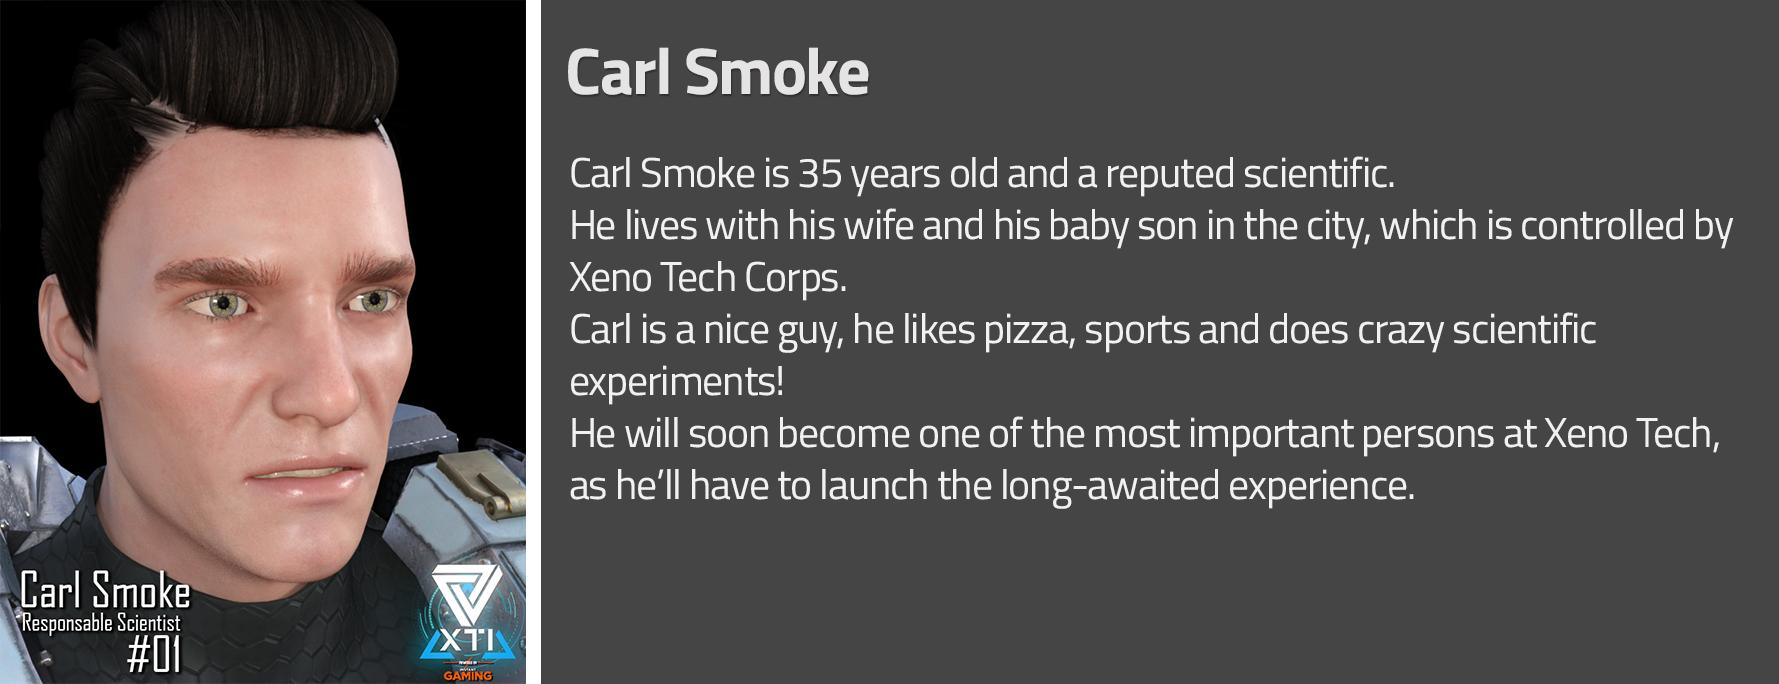 carl present